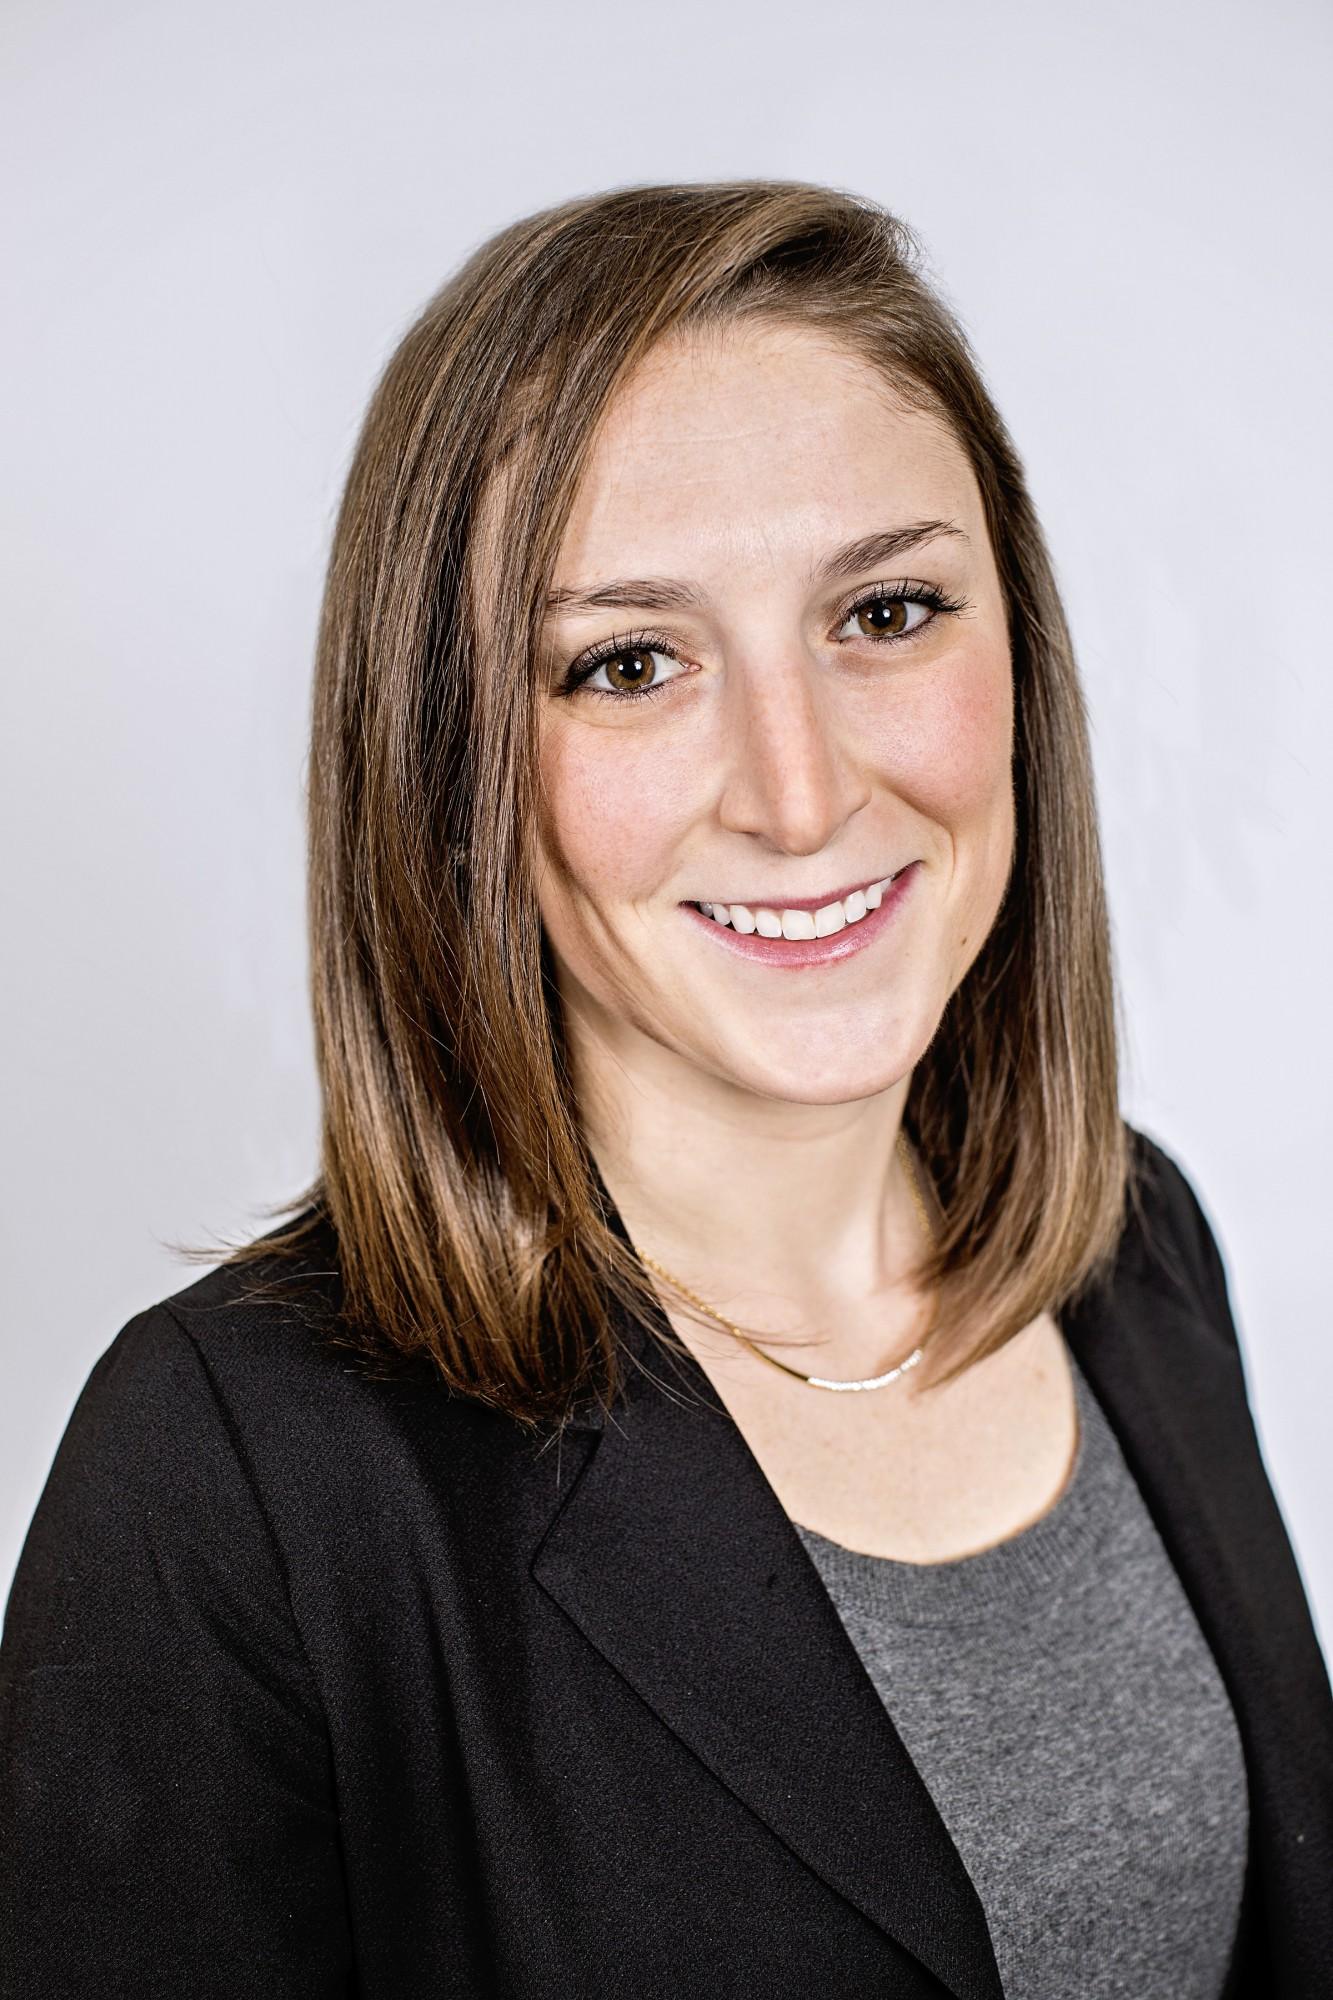 Jocelyn Simon